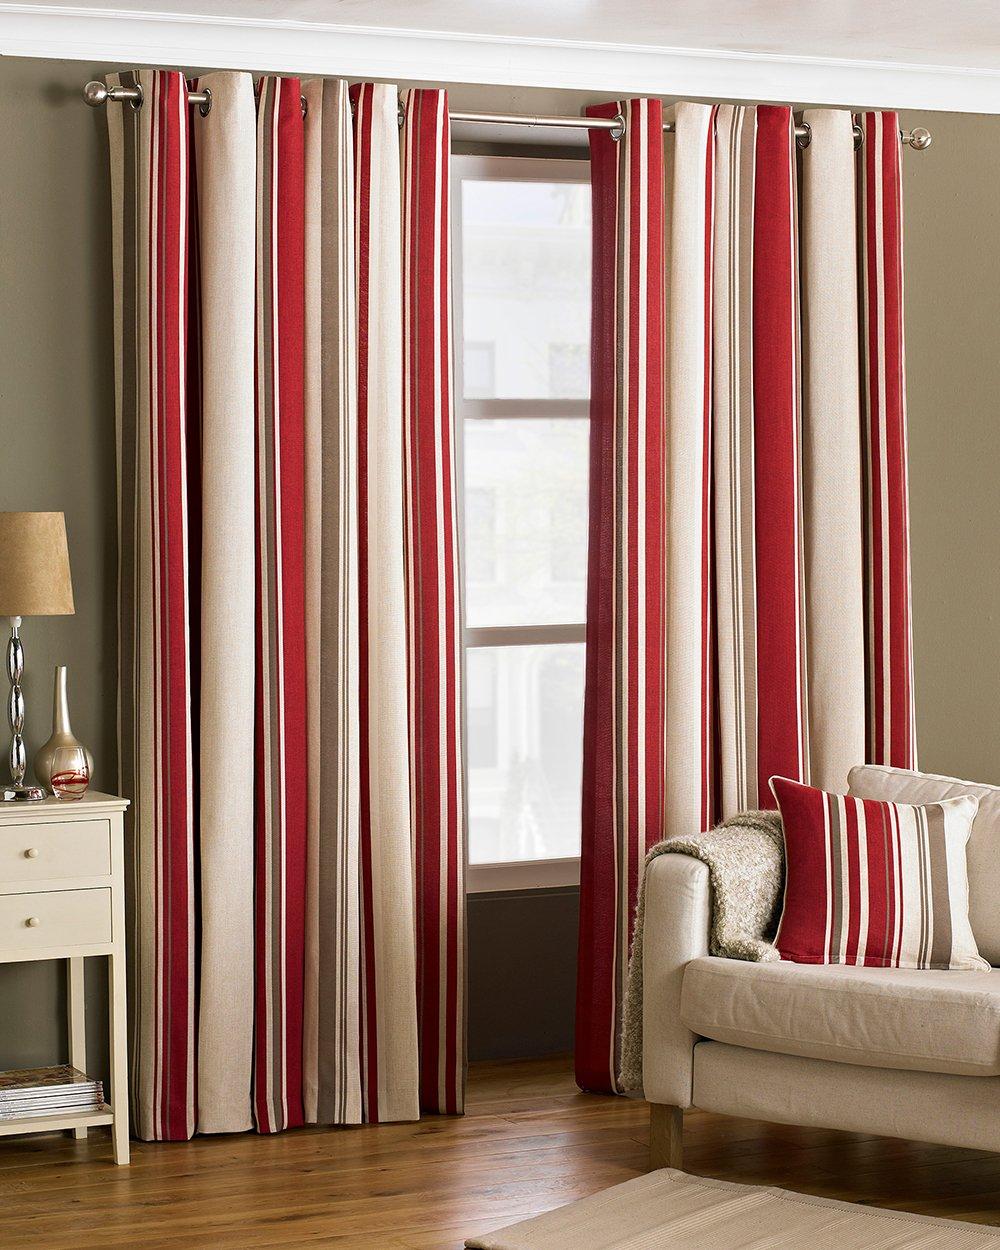 Riva Paoletti Broadway Ringtop Eyelet Curtains Pair